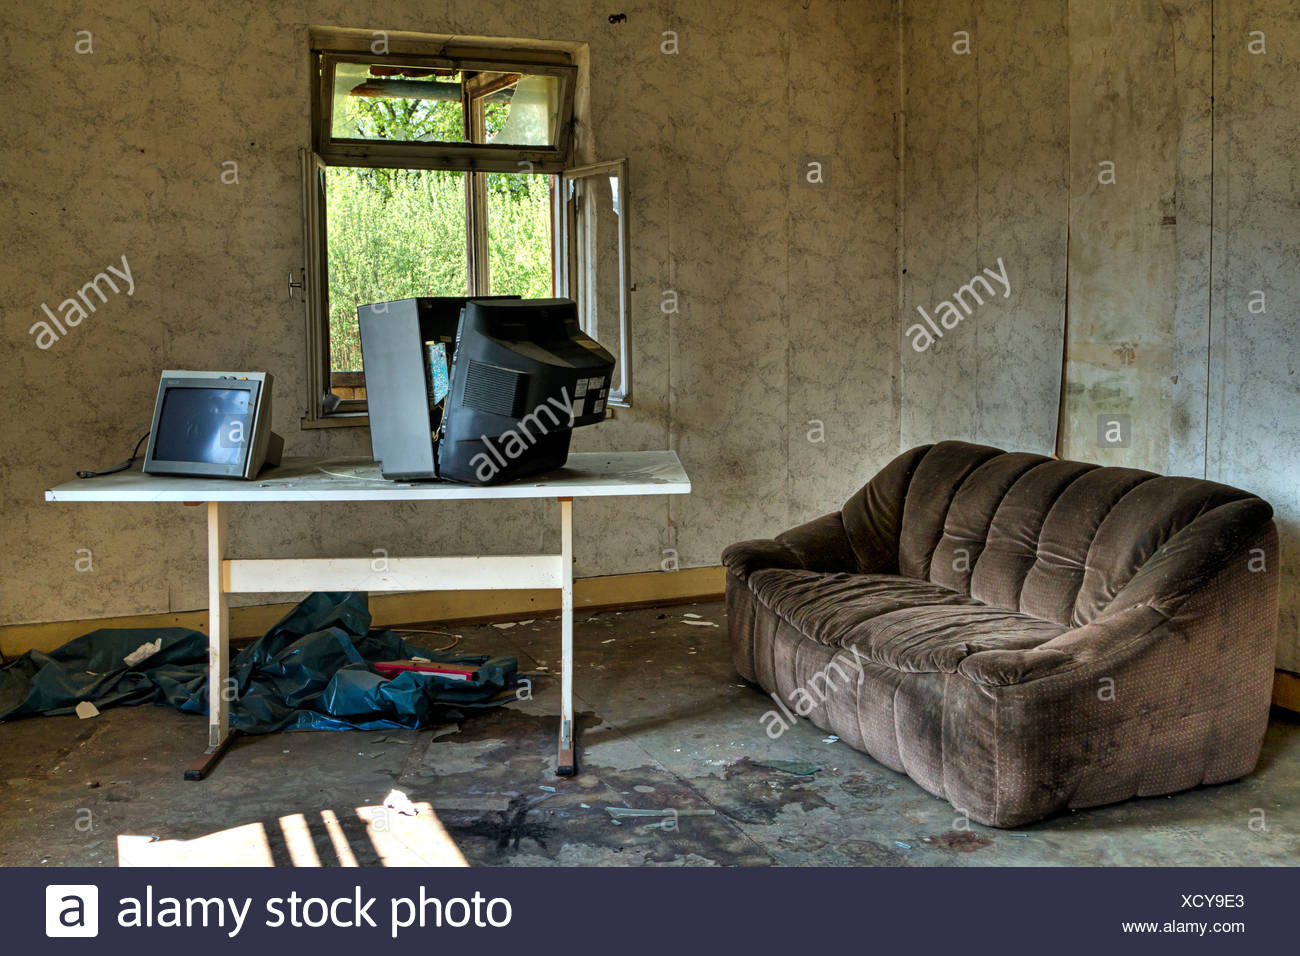 Wohnzimmer Sofa Tv Ruinosen Altbau Stockfoto Bild 283341915 Alamy